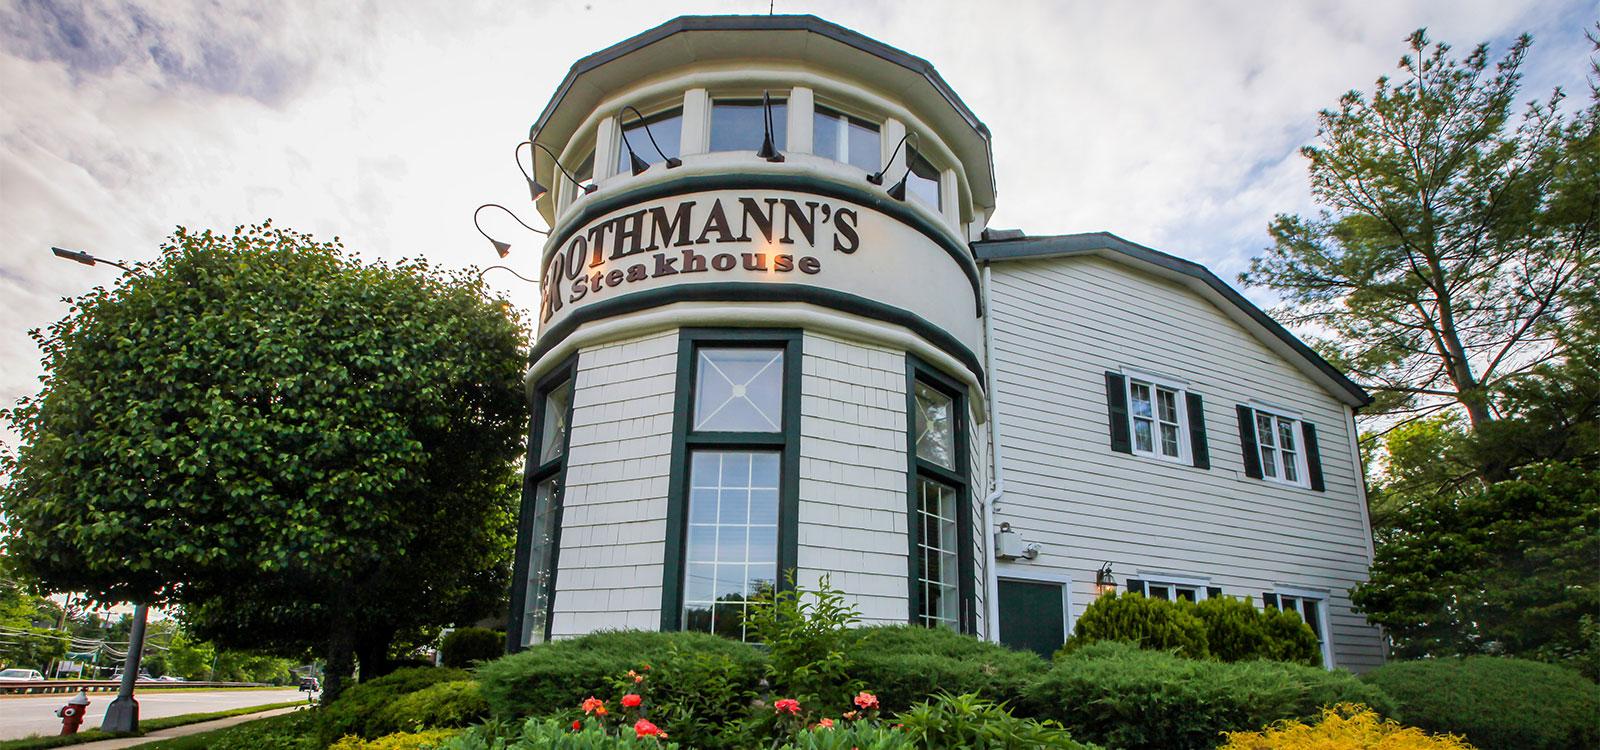 Portrait of Rothmann's Steakhouse